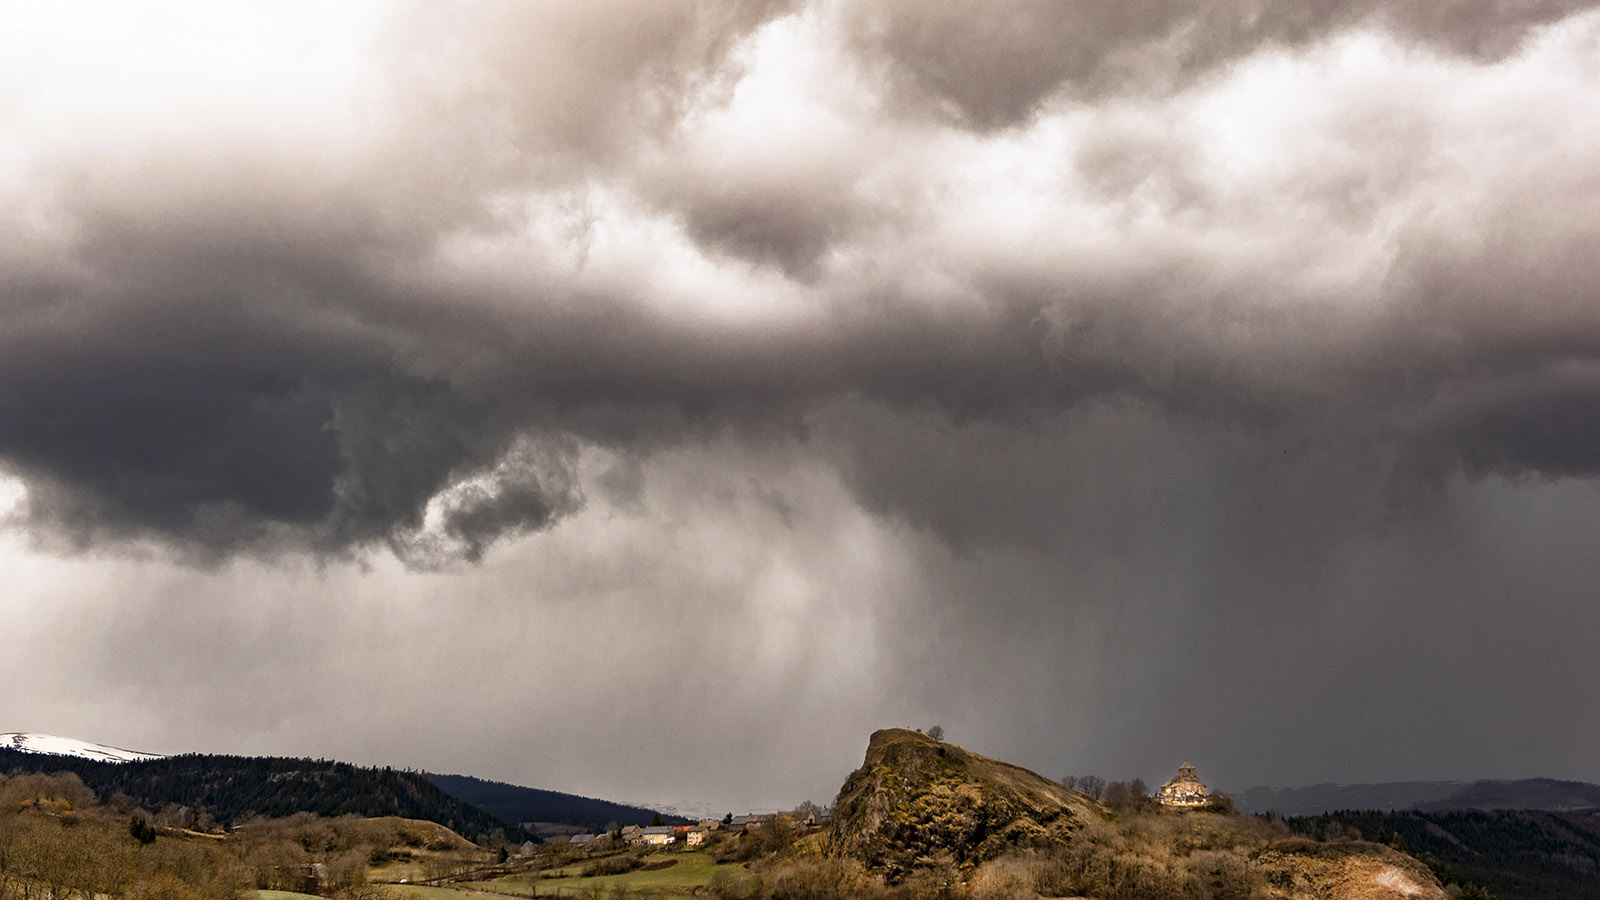 Auvergne: Wettergewaltig: Albepierre im Cantal. Foto: Hilke Maunder